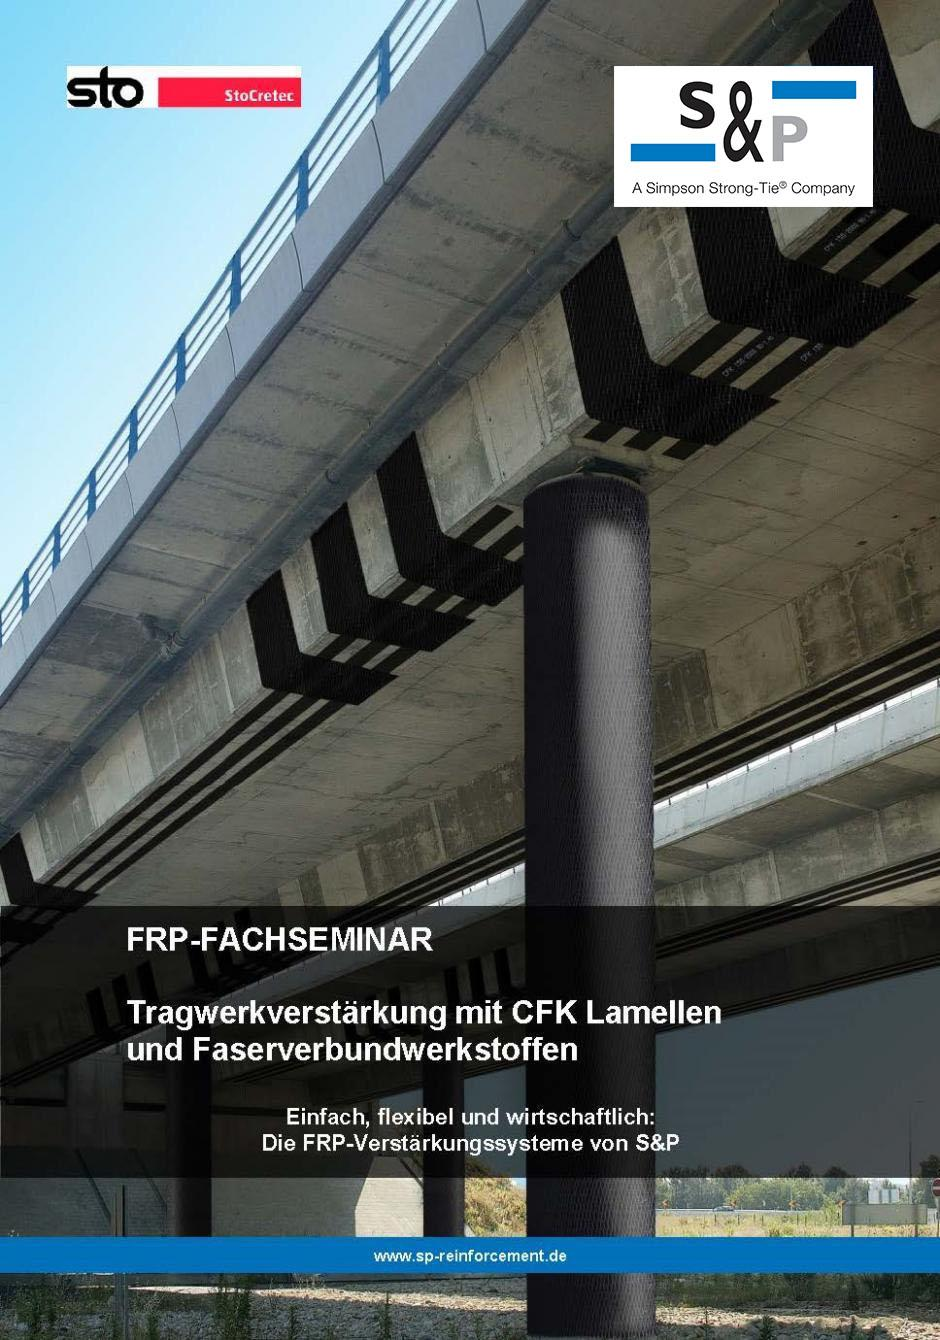 FRP Seminar in Dresden